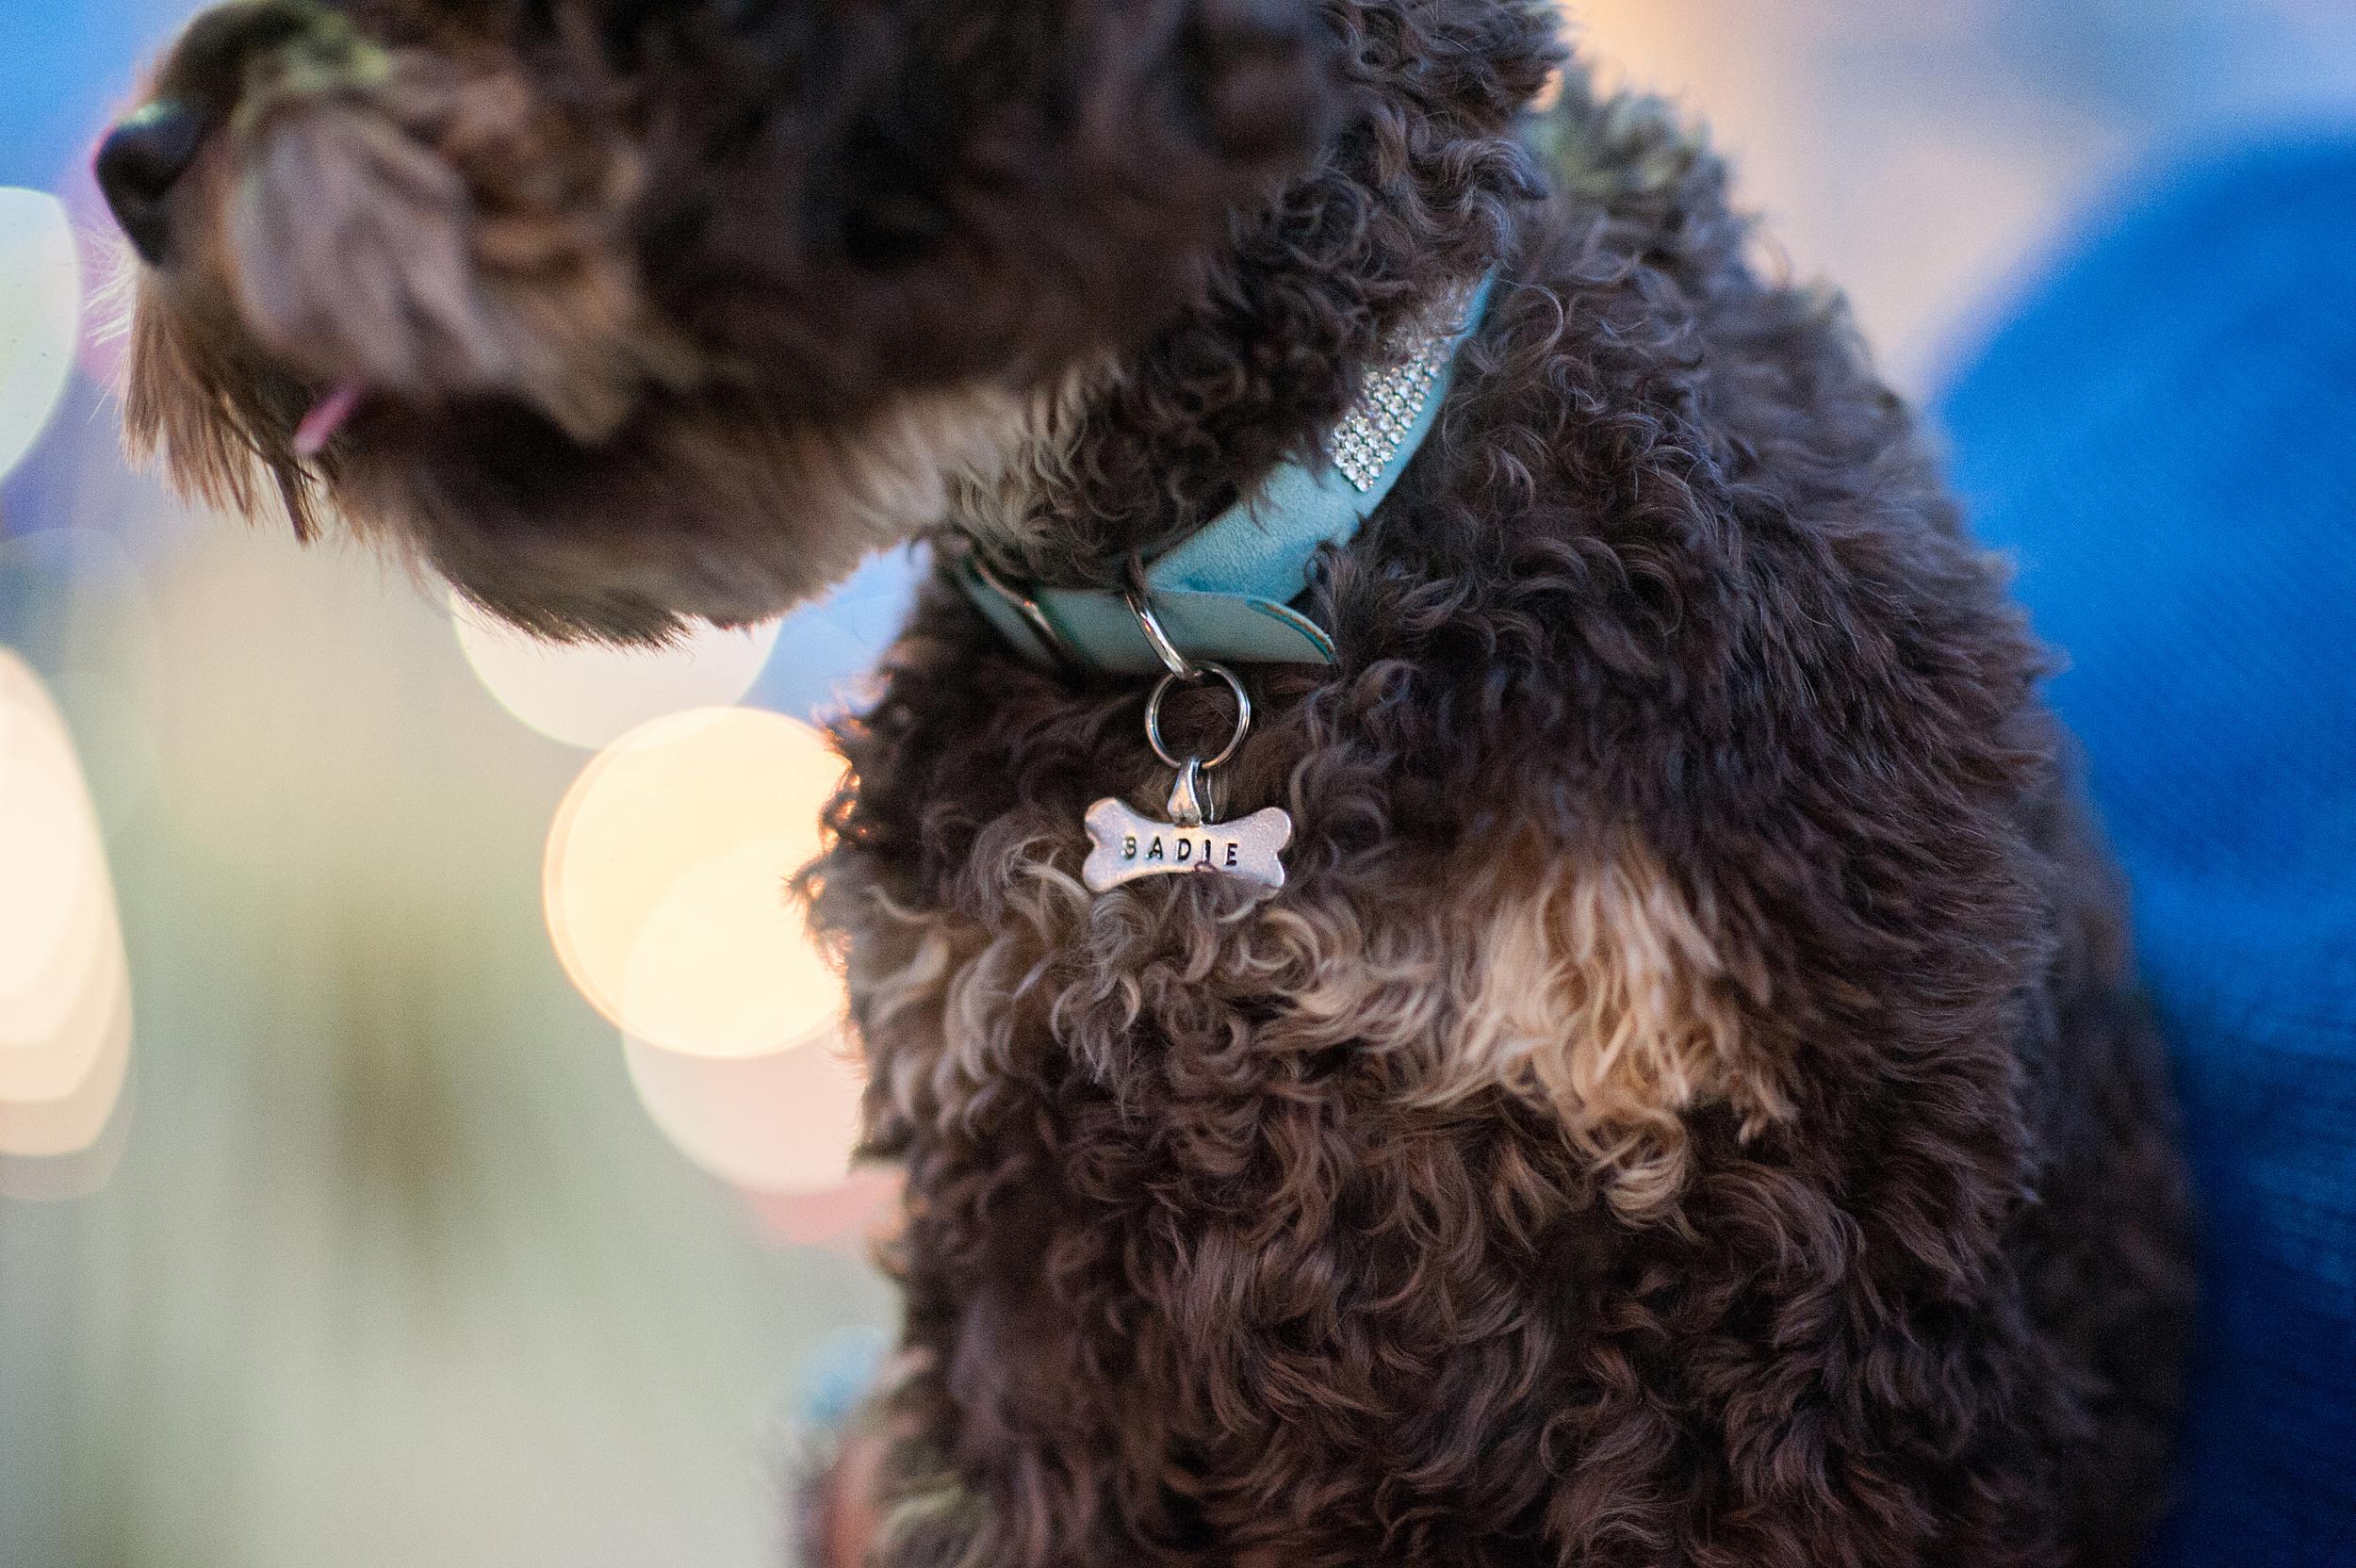 pittsburgh-pet-photographer-sadie-15.jpg